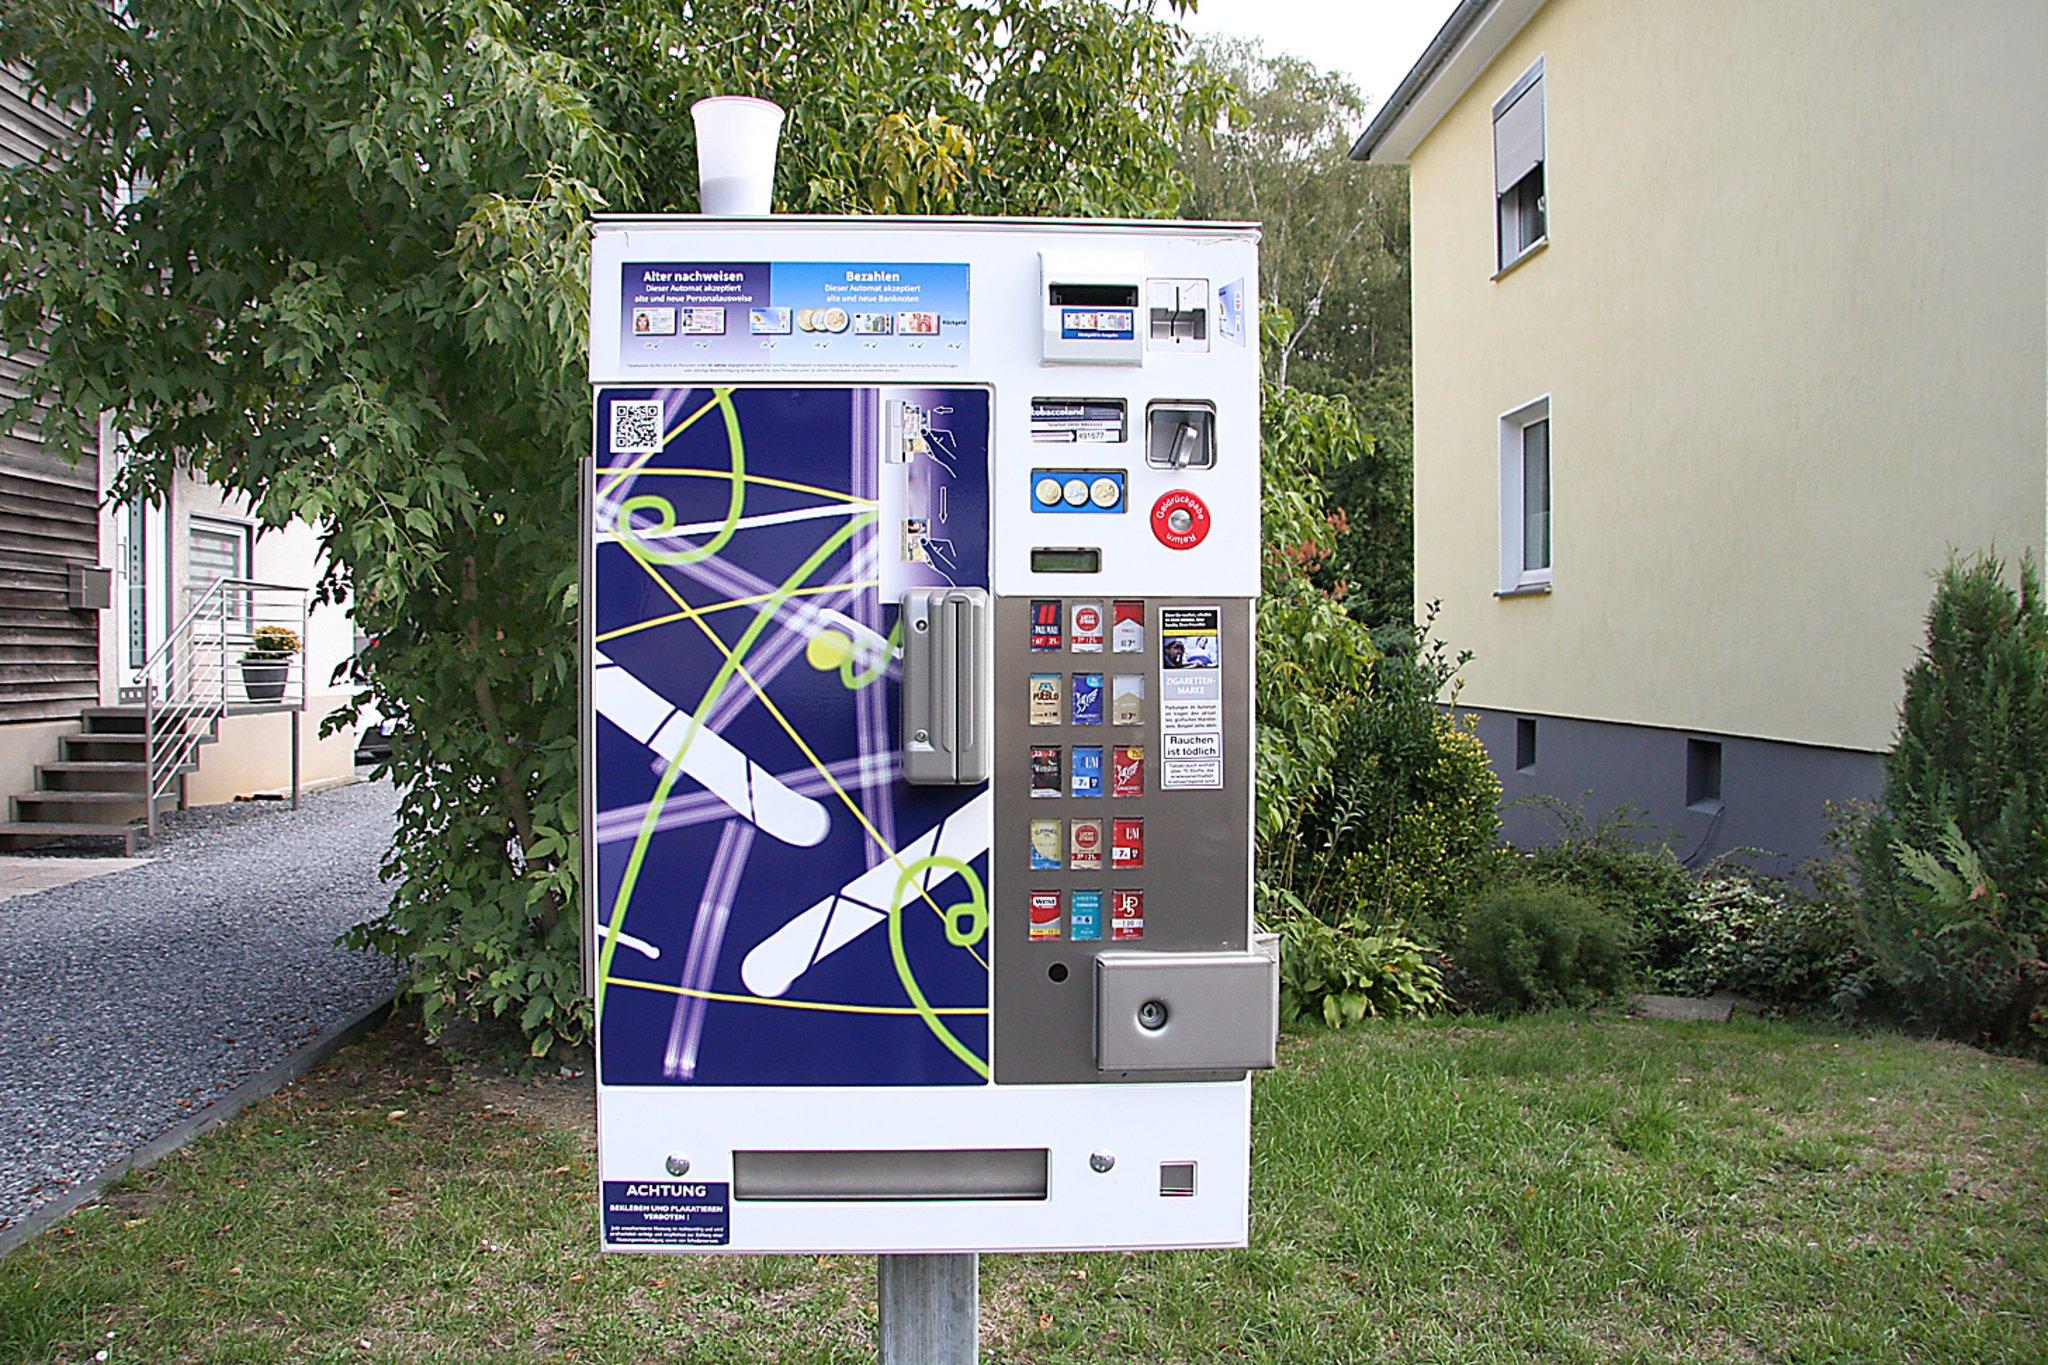 Zigarettenautomaten in der nähe | Zigarettenautomat. 2020